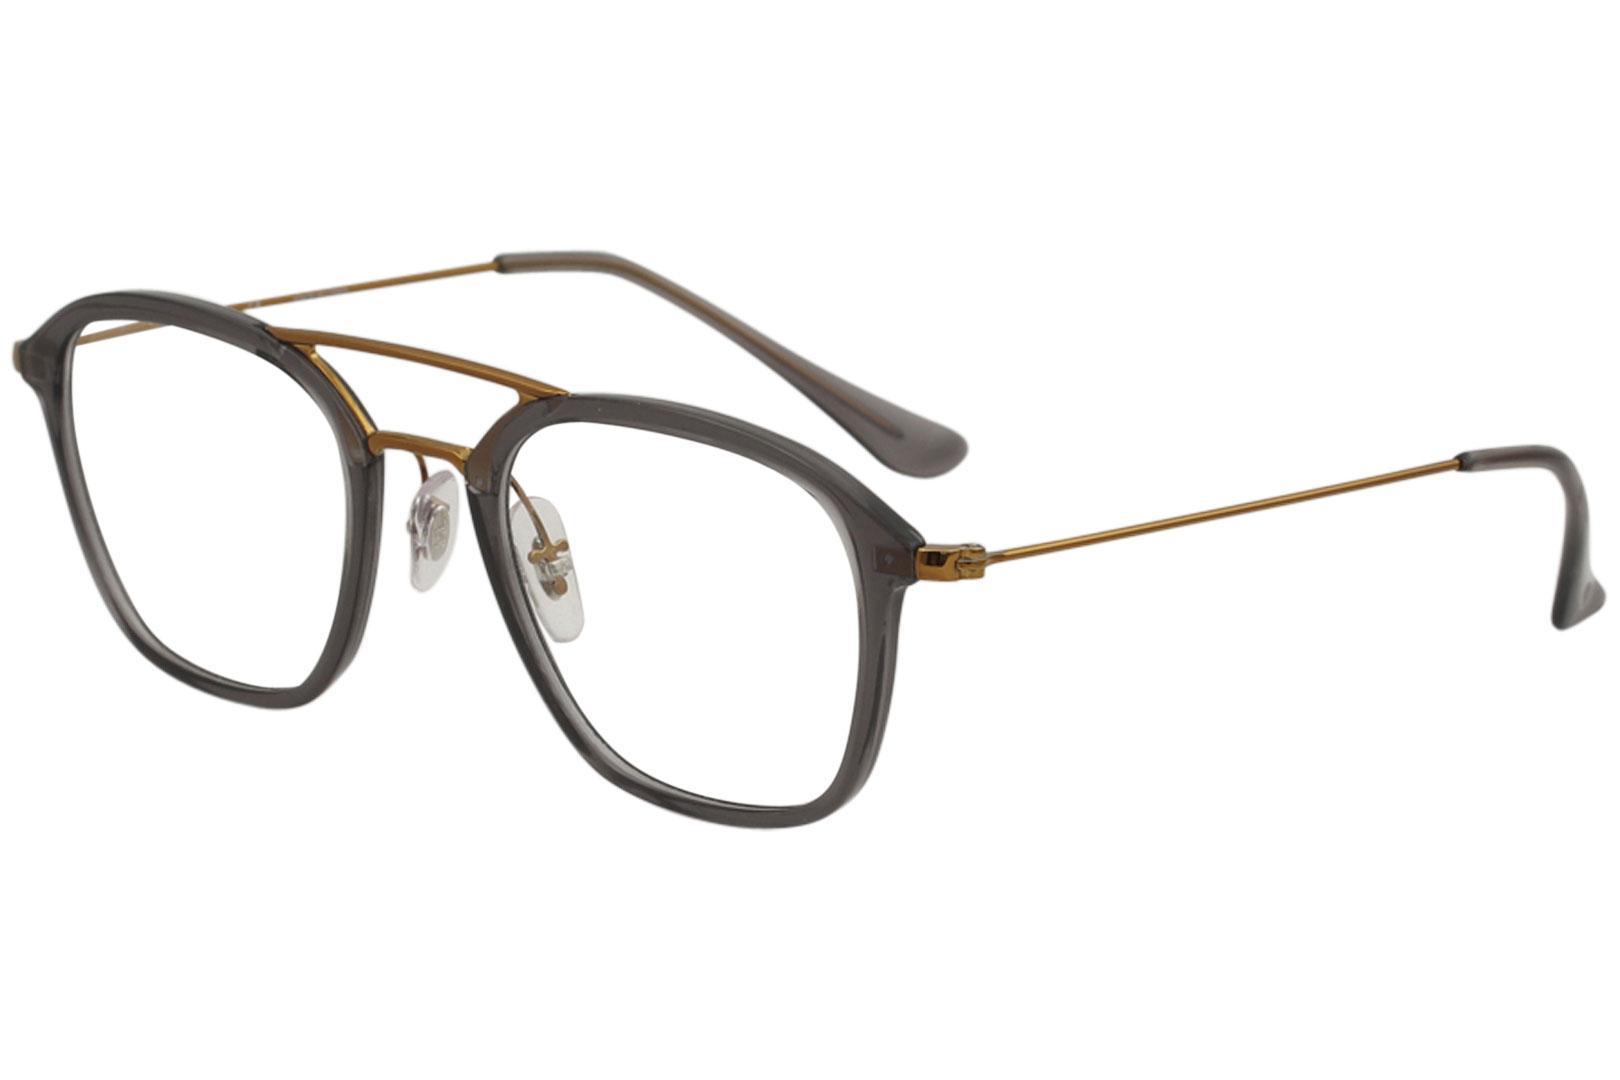 b9743d4f25 Ray Ban Men s Eyeglasses RB7098 RB 7098 RayBan Full Rim Optical Frame by Ray  Ban